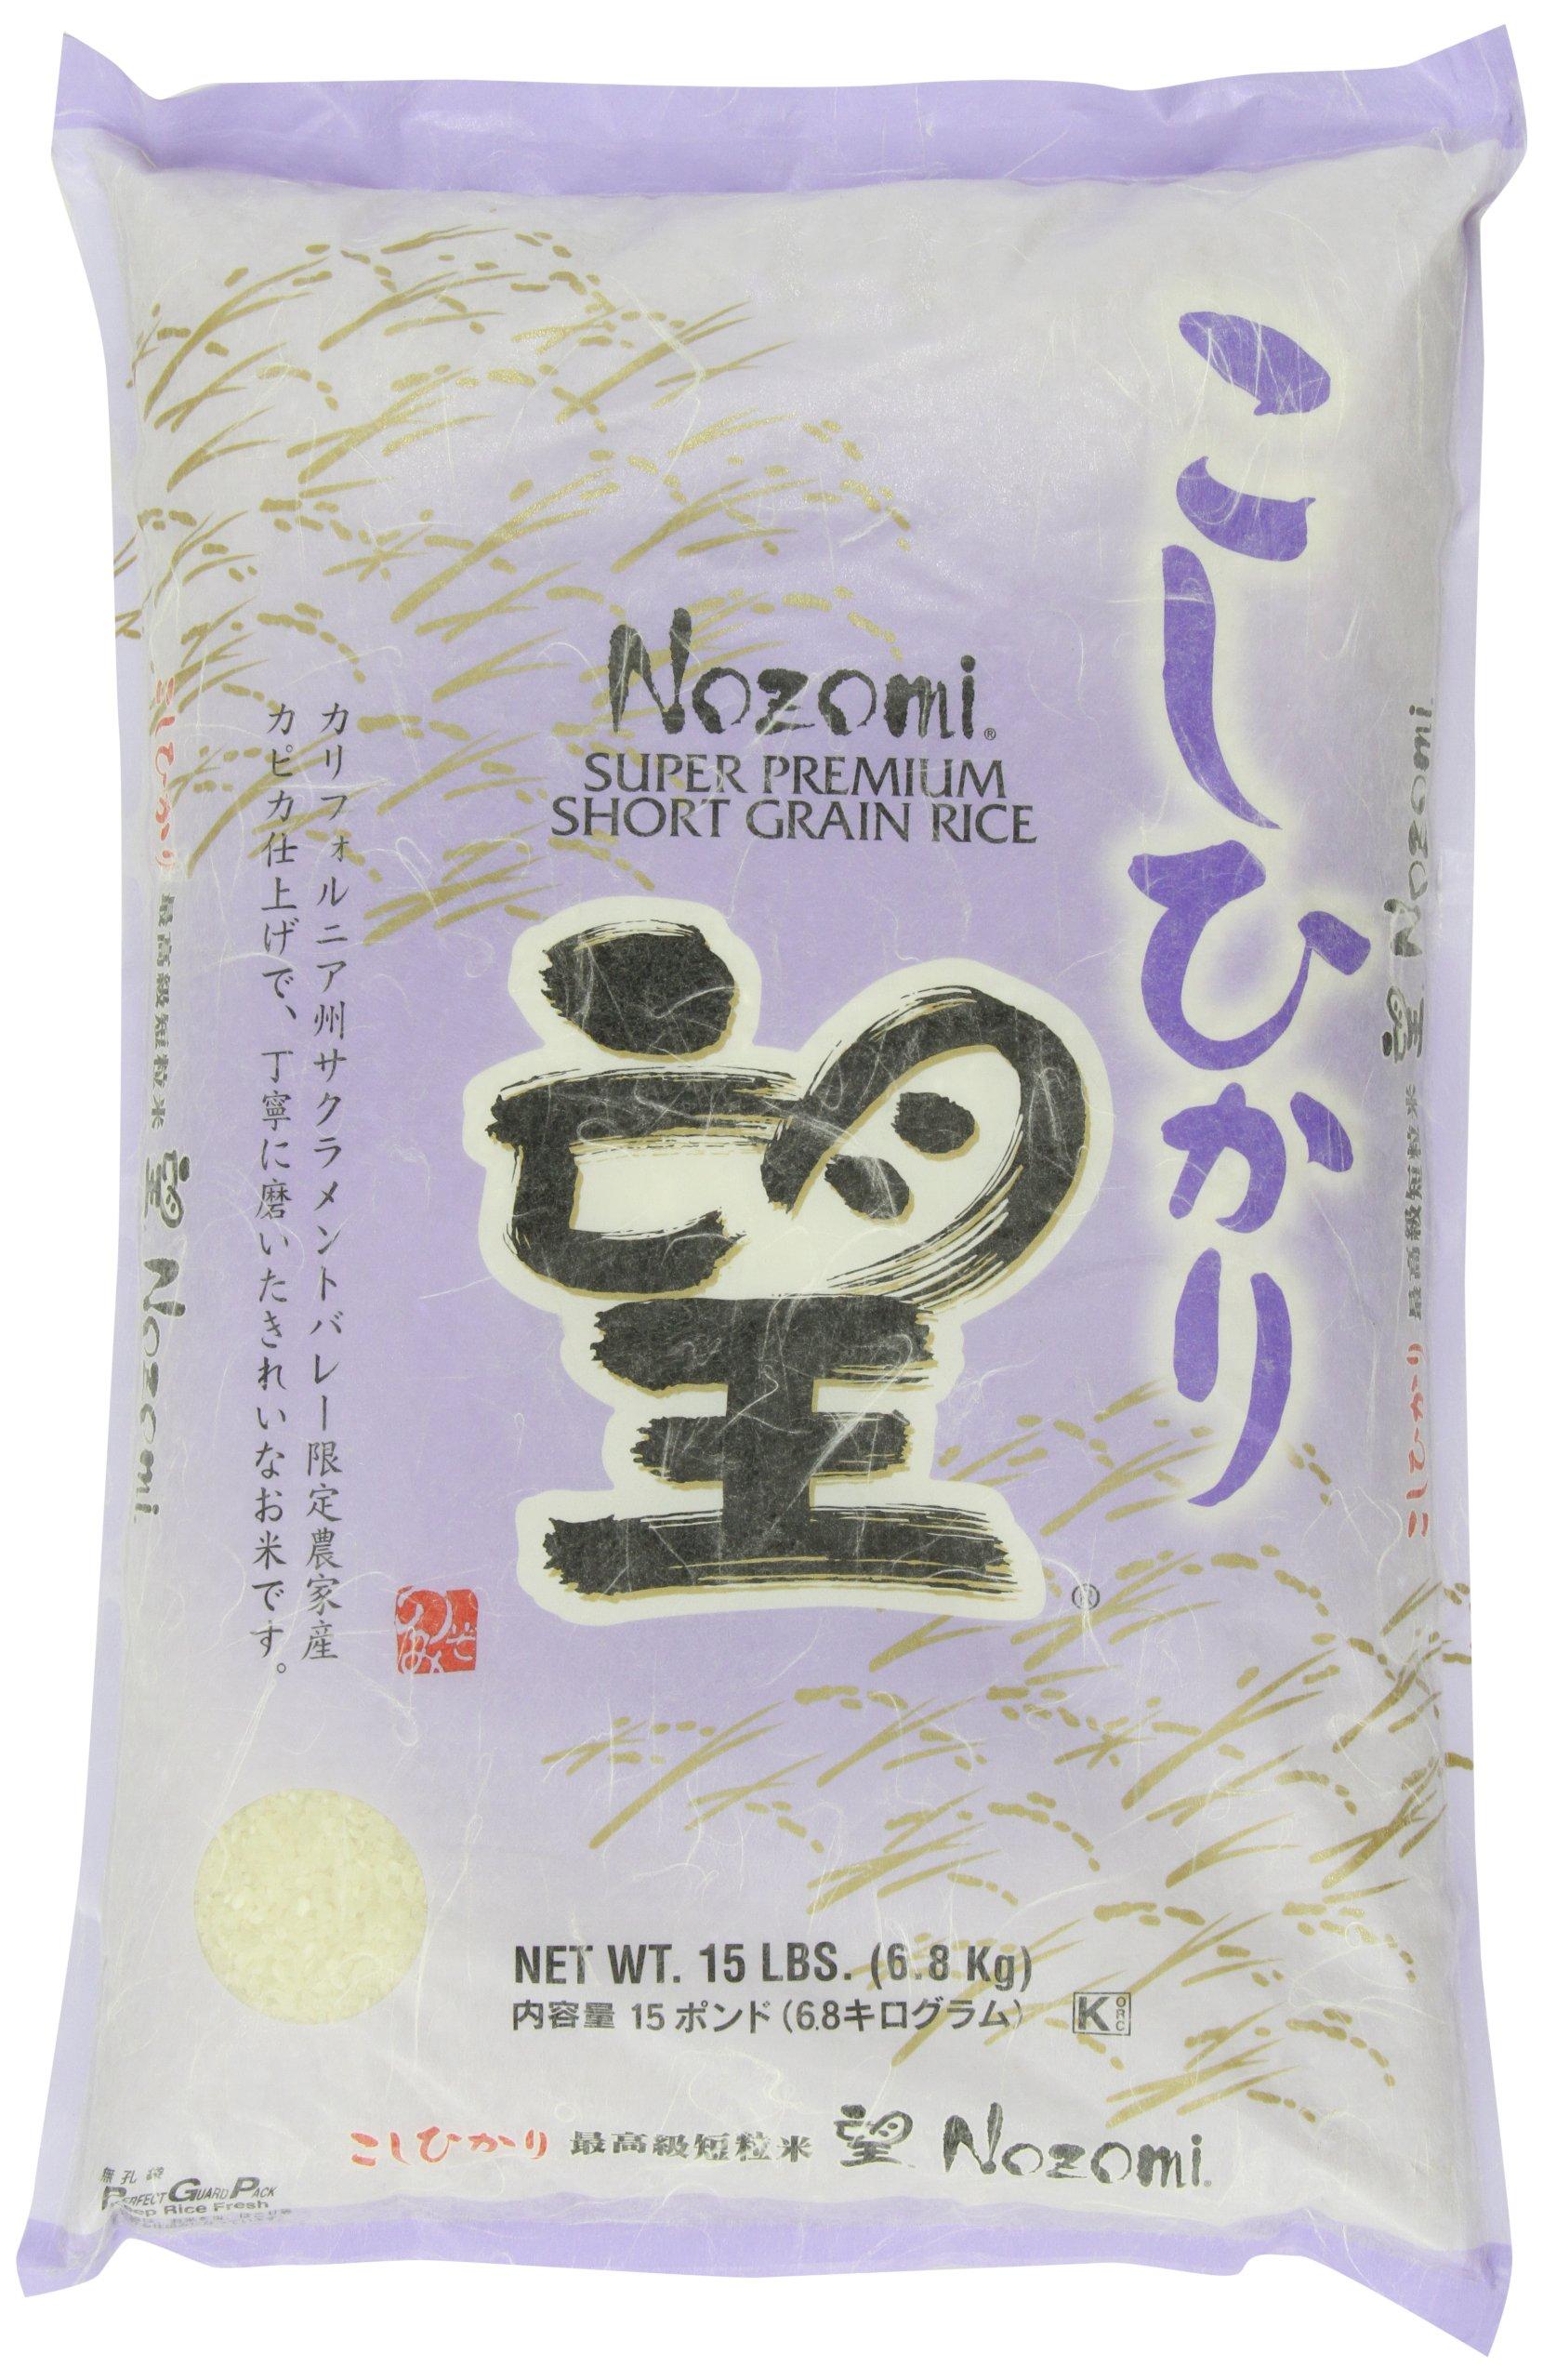 Nozomi Super Premium Short Grain Rice, 15-Pound